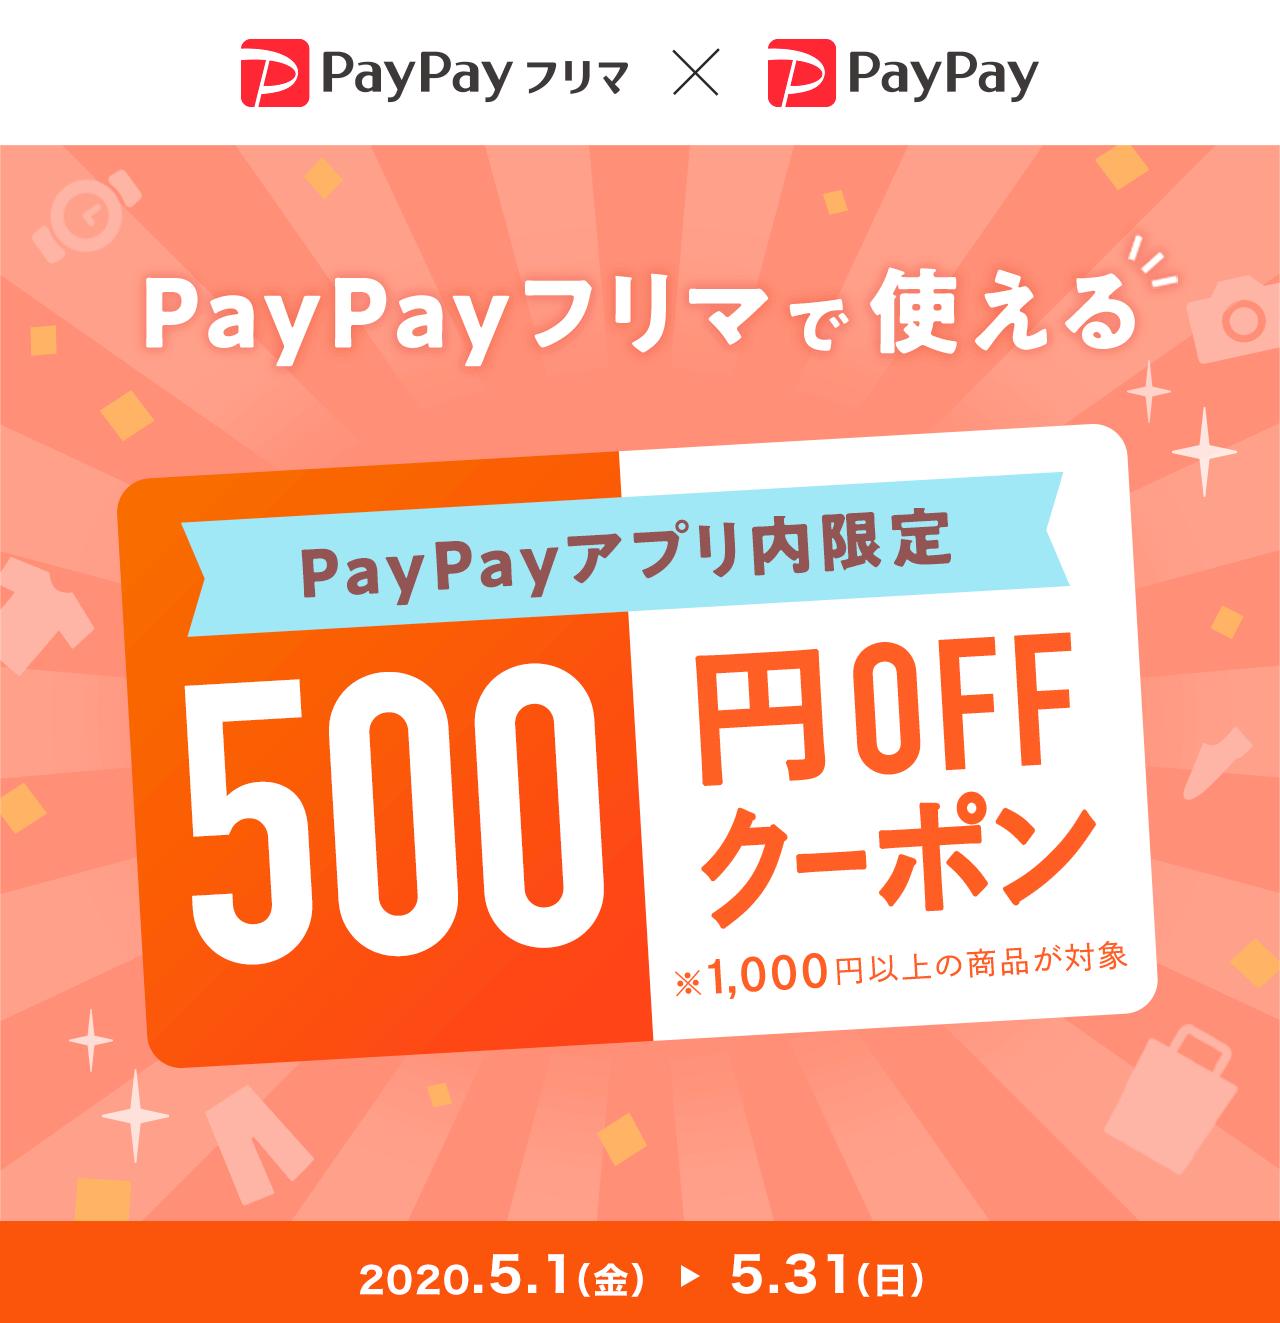 PayPayフリマで使える PayPayアプリ内限定500円OFFクーポン